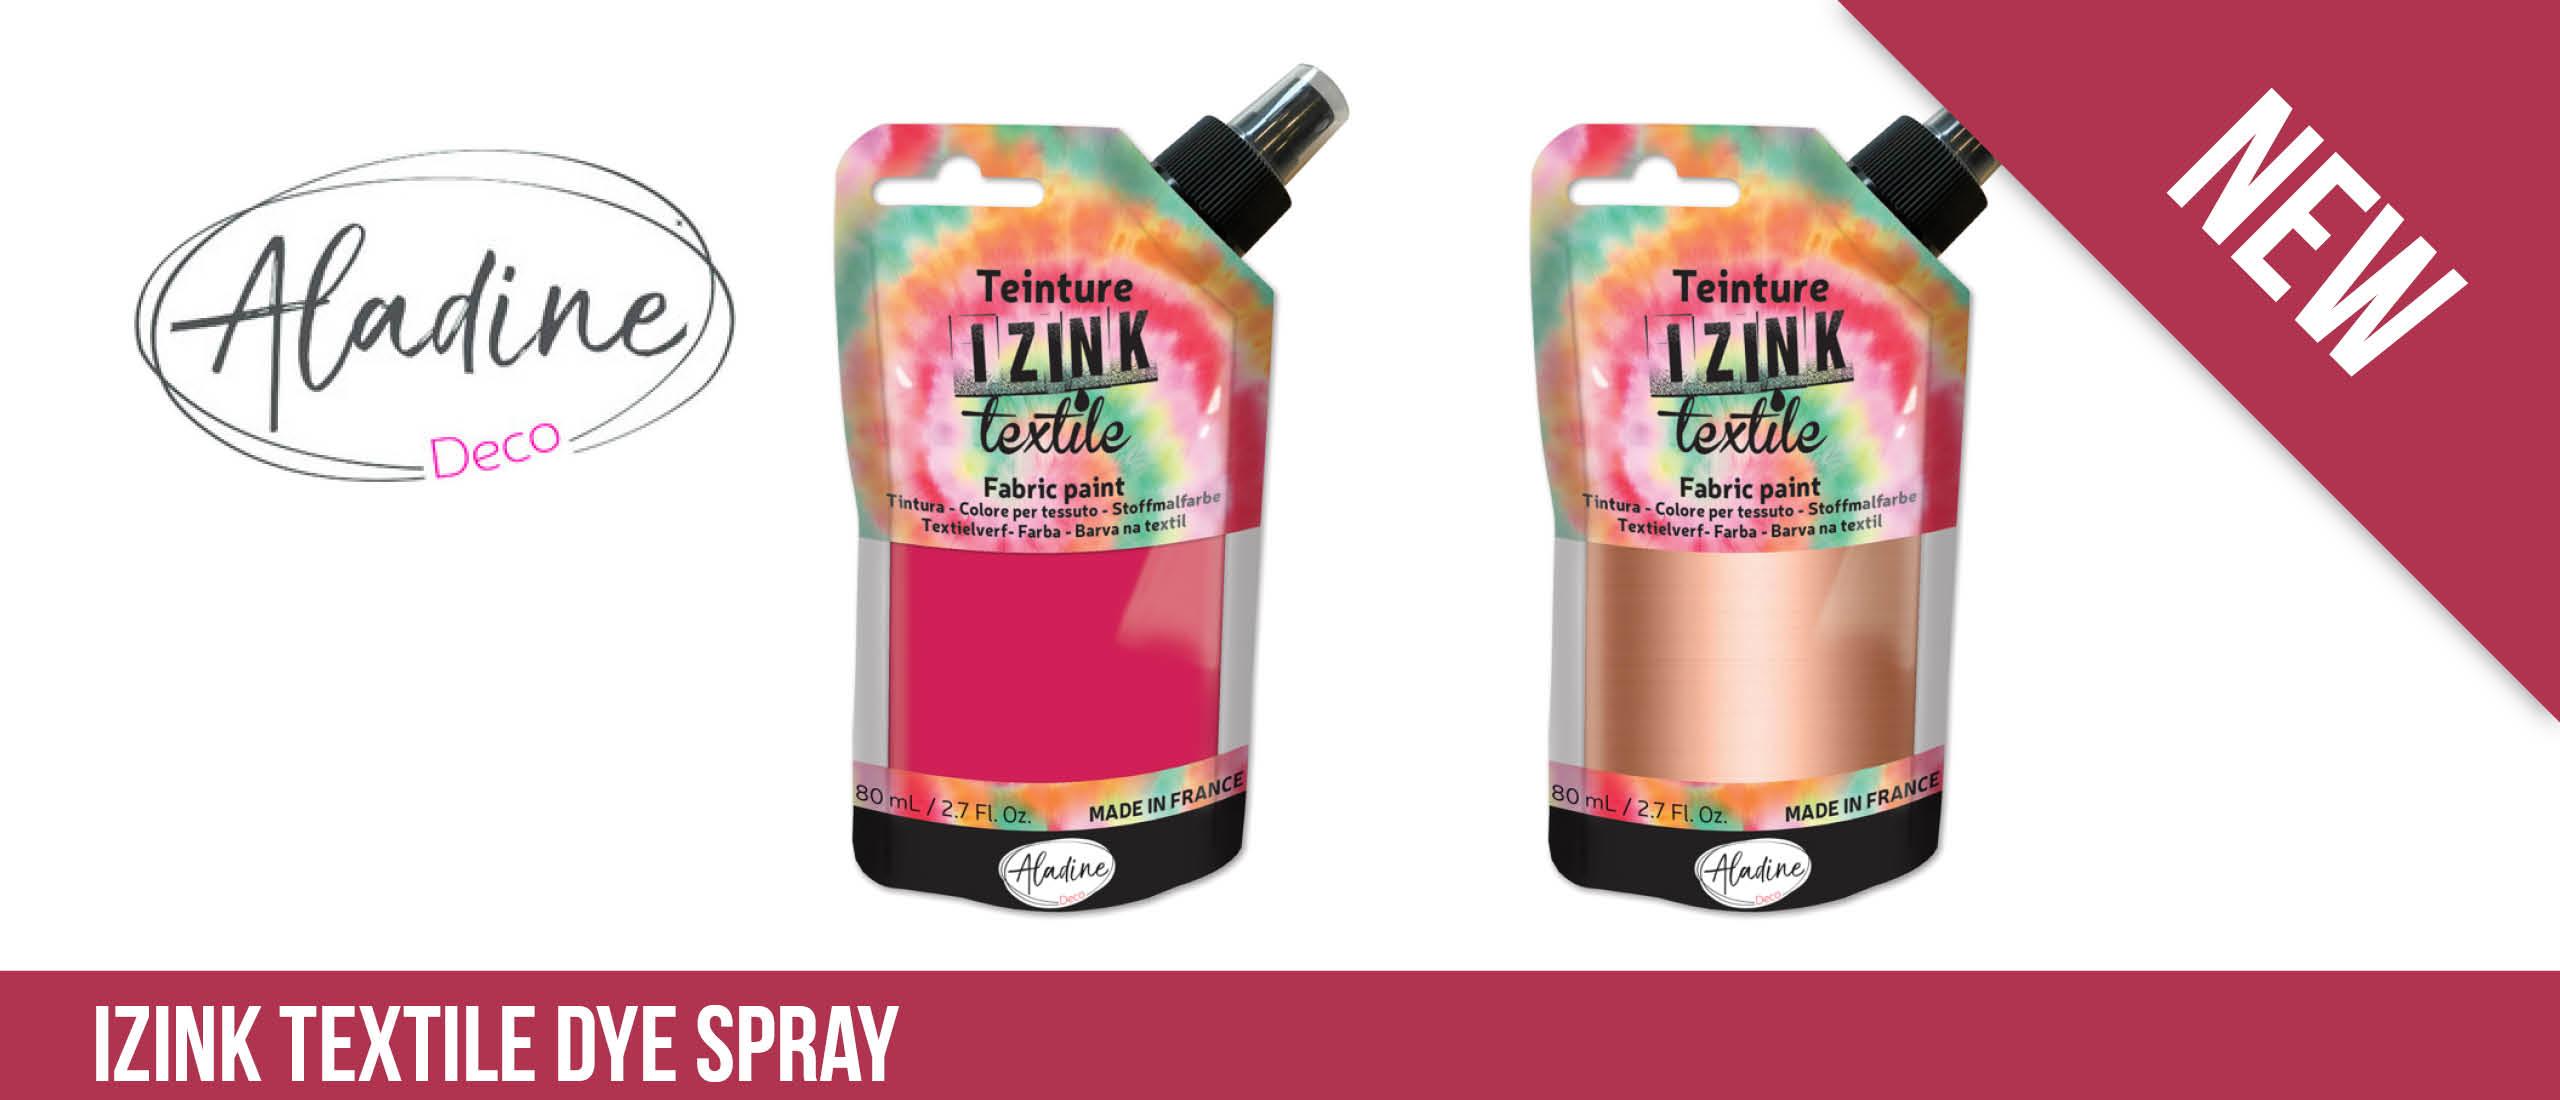 Textile Dye Spray Izink van Aladine